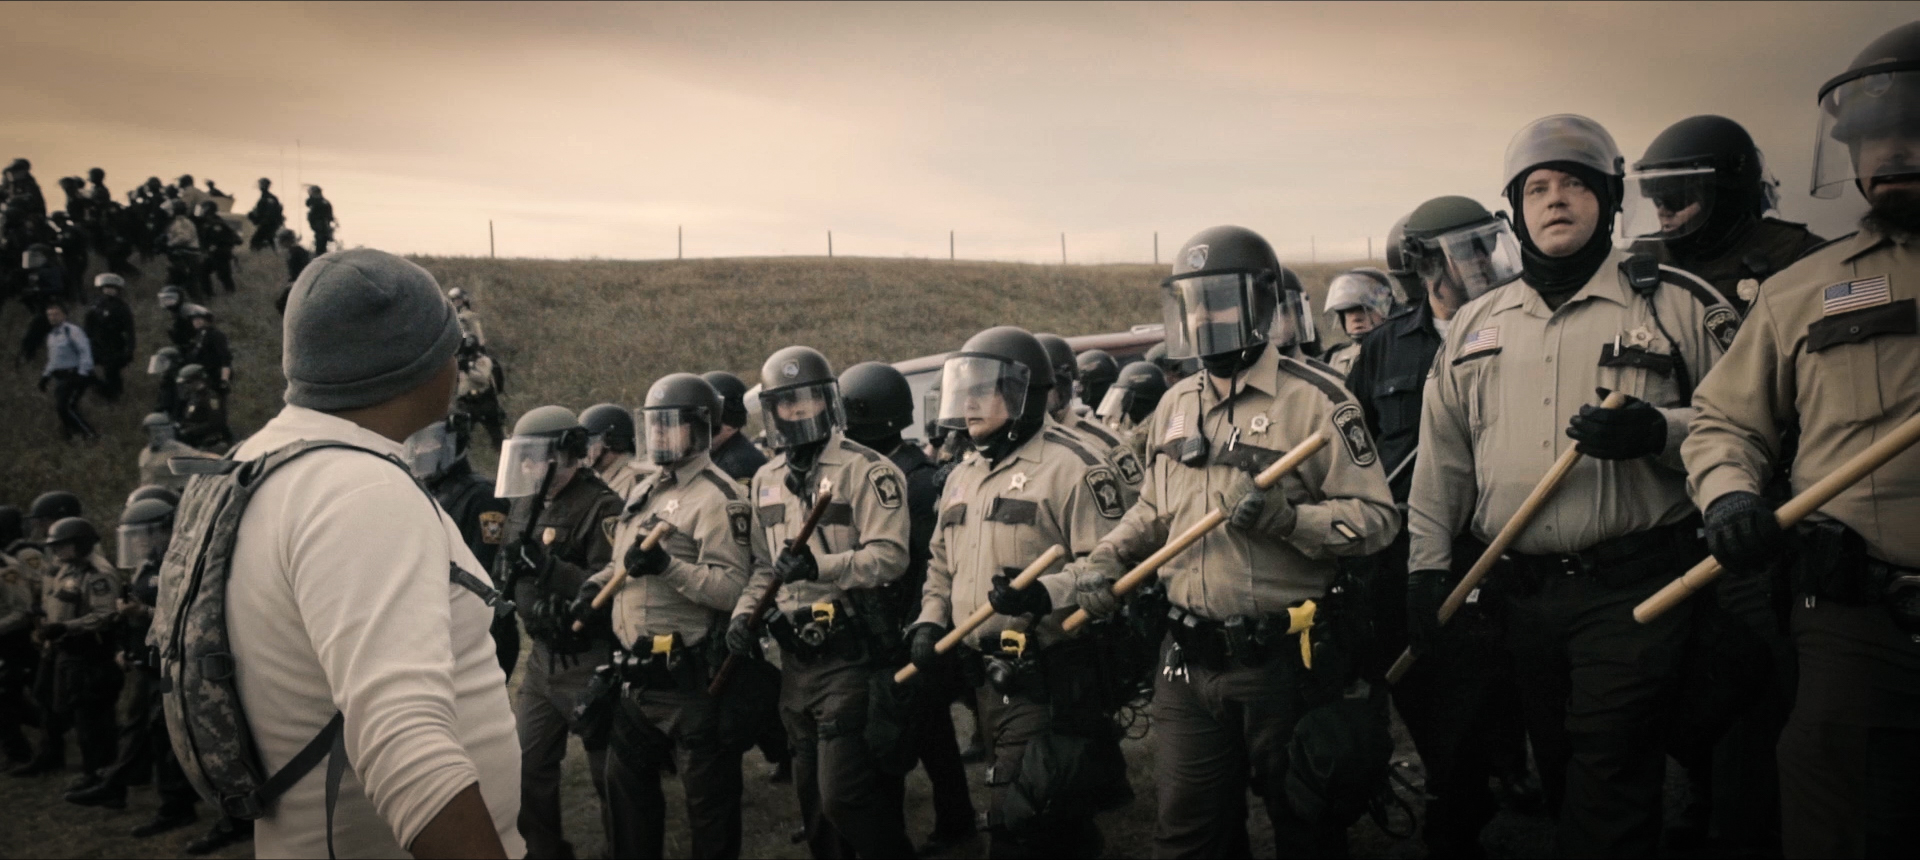 Police Line_1 (1 of 1).jpg